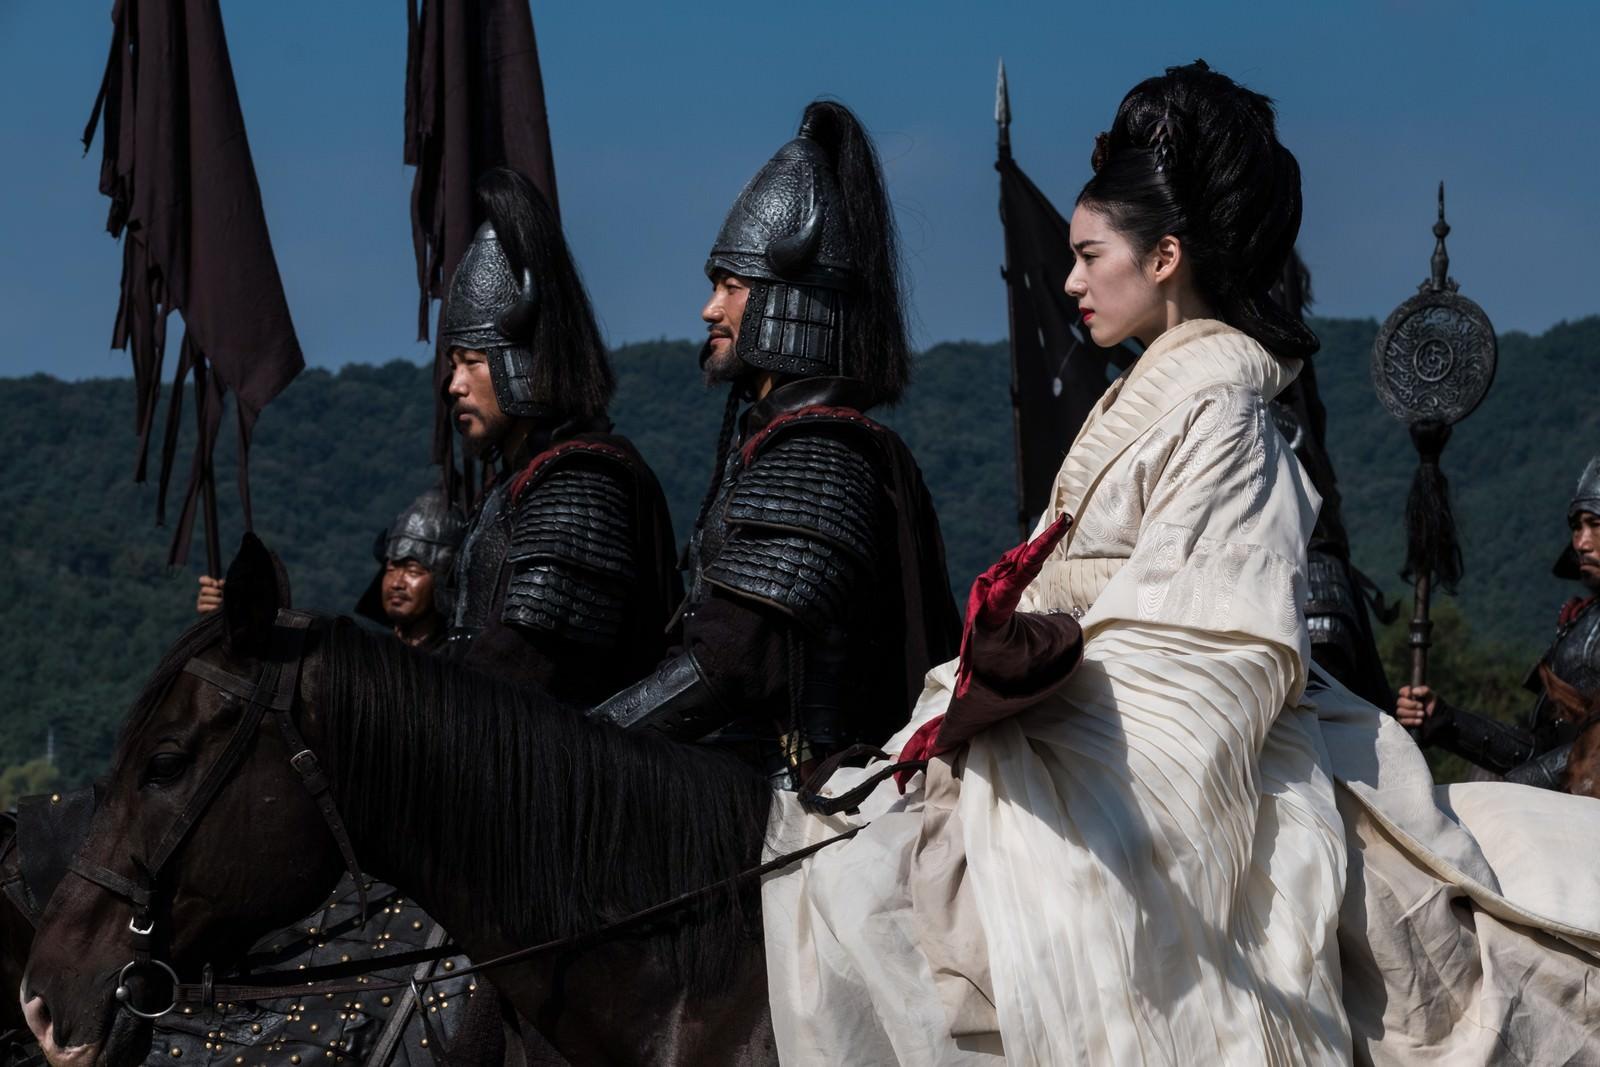 Movie, 안시성(韓國, 2018) / 浴血圍城88天(台灣) / 安市城(香港) / The Great Battle(英文), 電影劇照, 軍隊